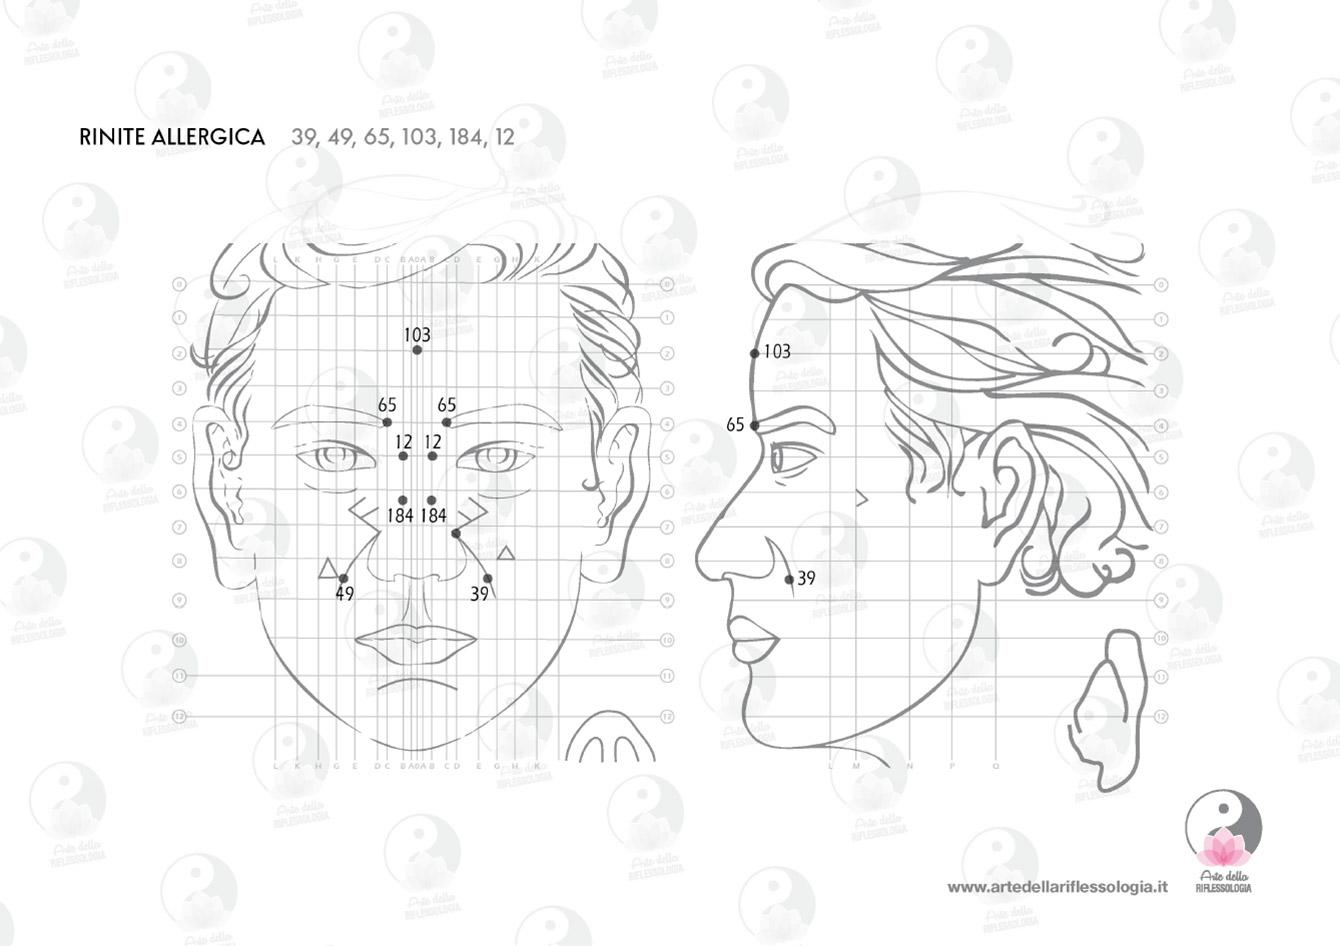 Schemi di Riflessologia Dien Chan: RINITE ALLERGICA